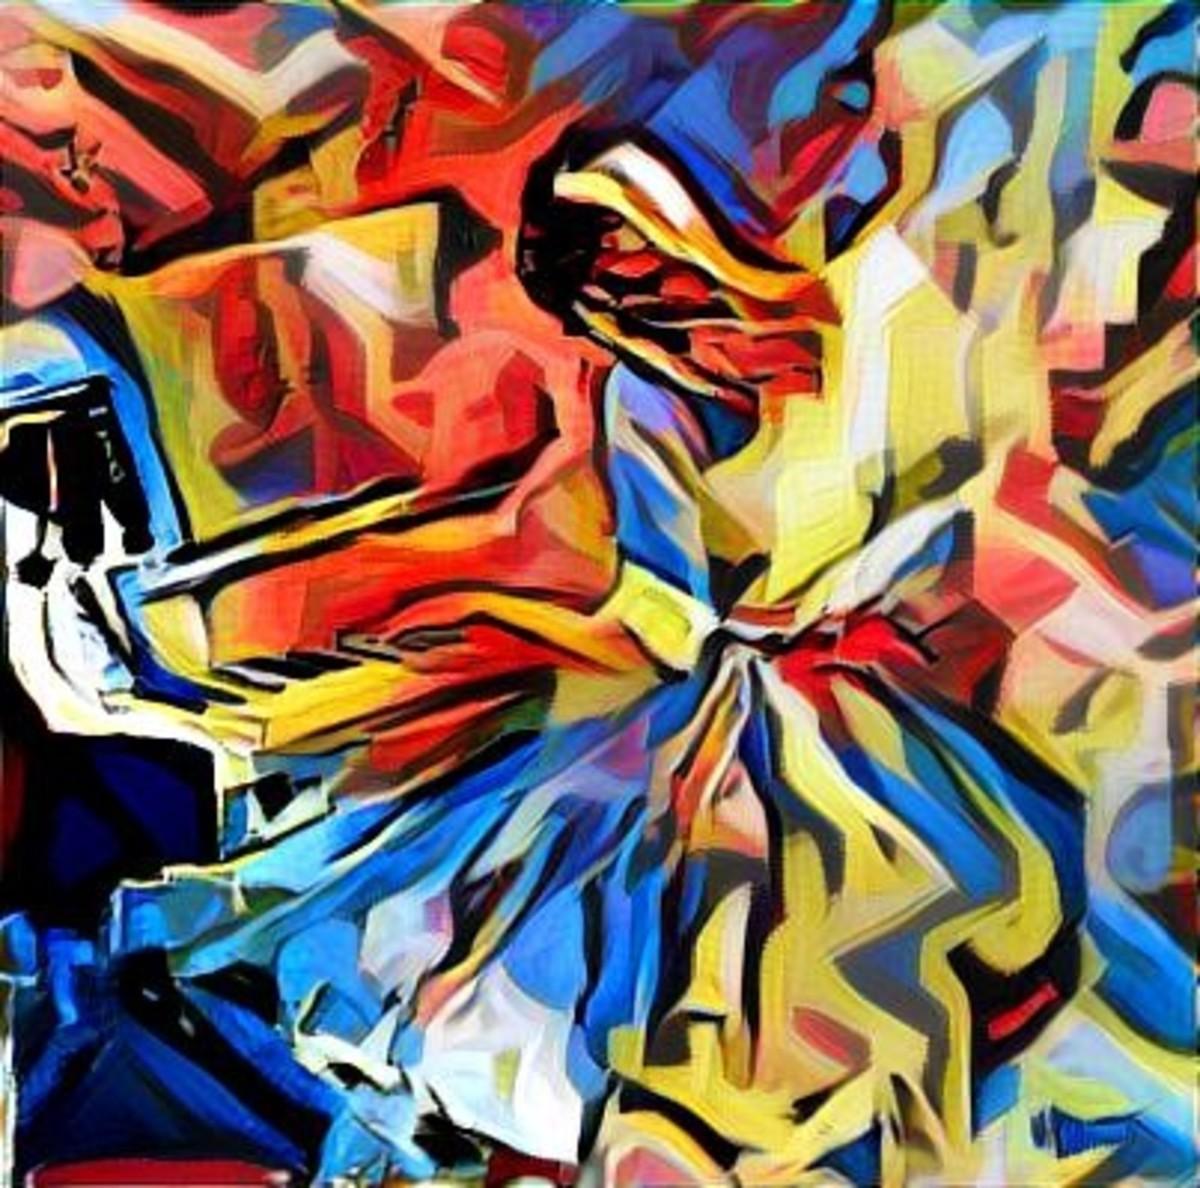 Sound Waves: Original Art by Gina Welds Hulse